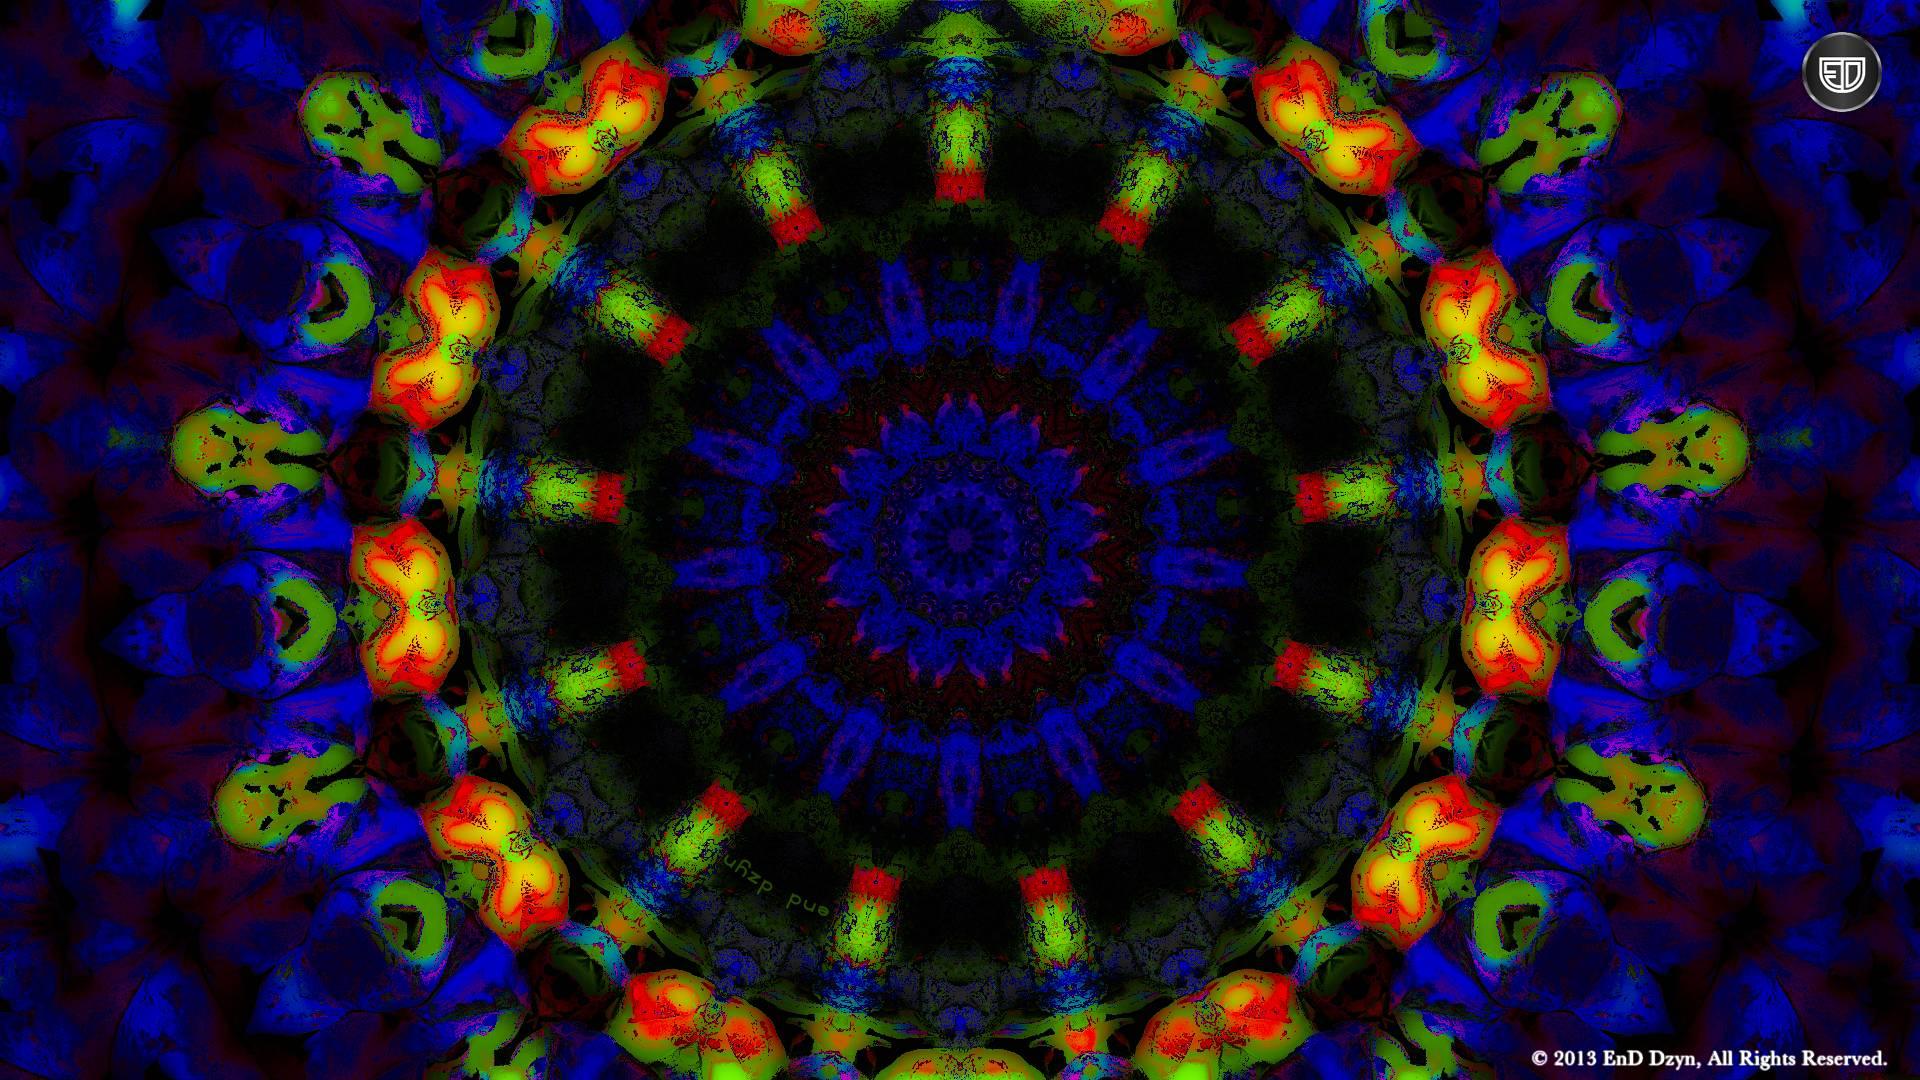 3D Hd Trippy Blue Psychedelic Desktop Wallpapers Photo 62081 Label